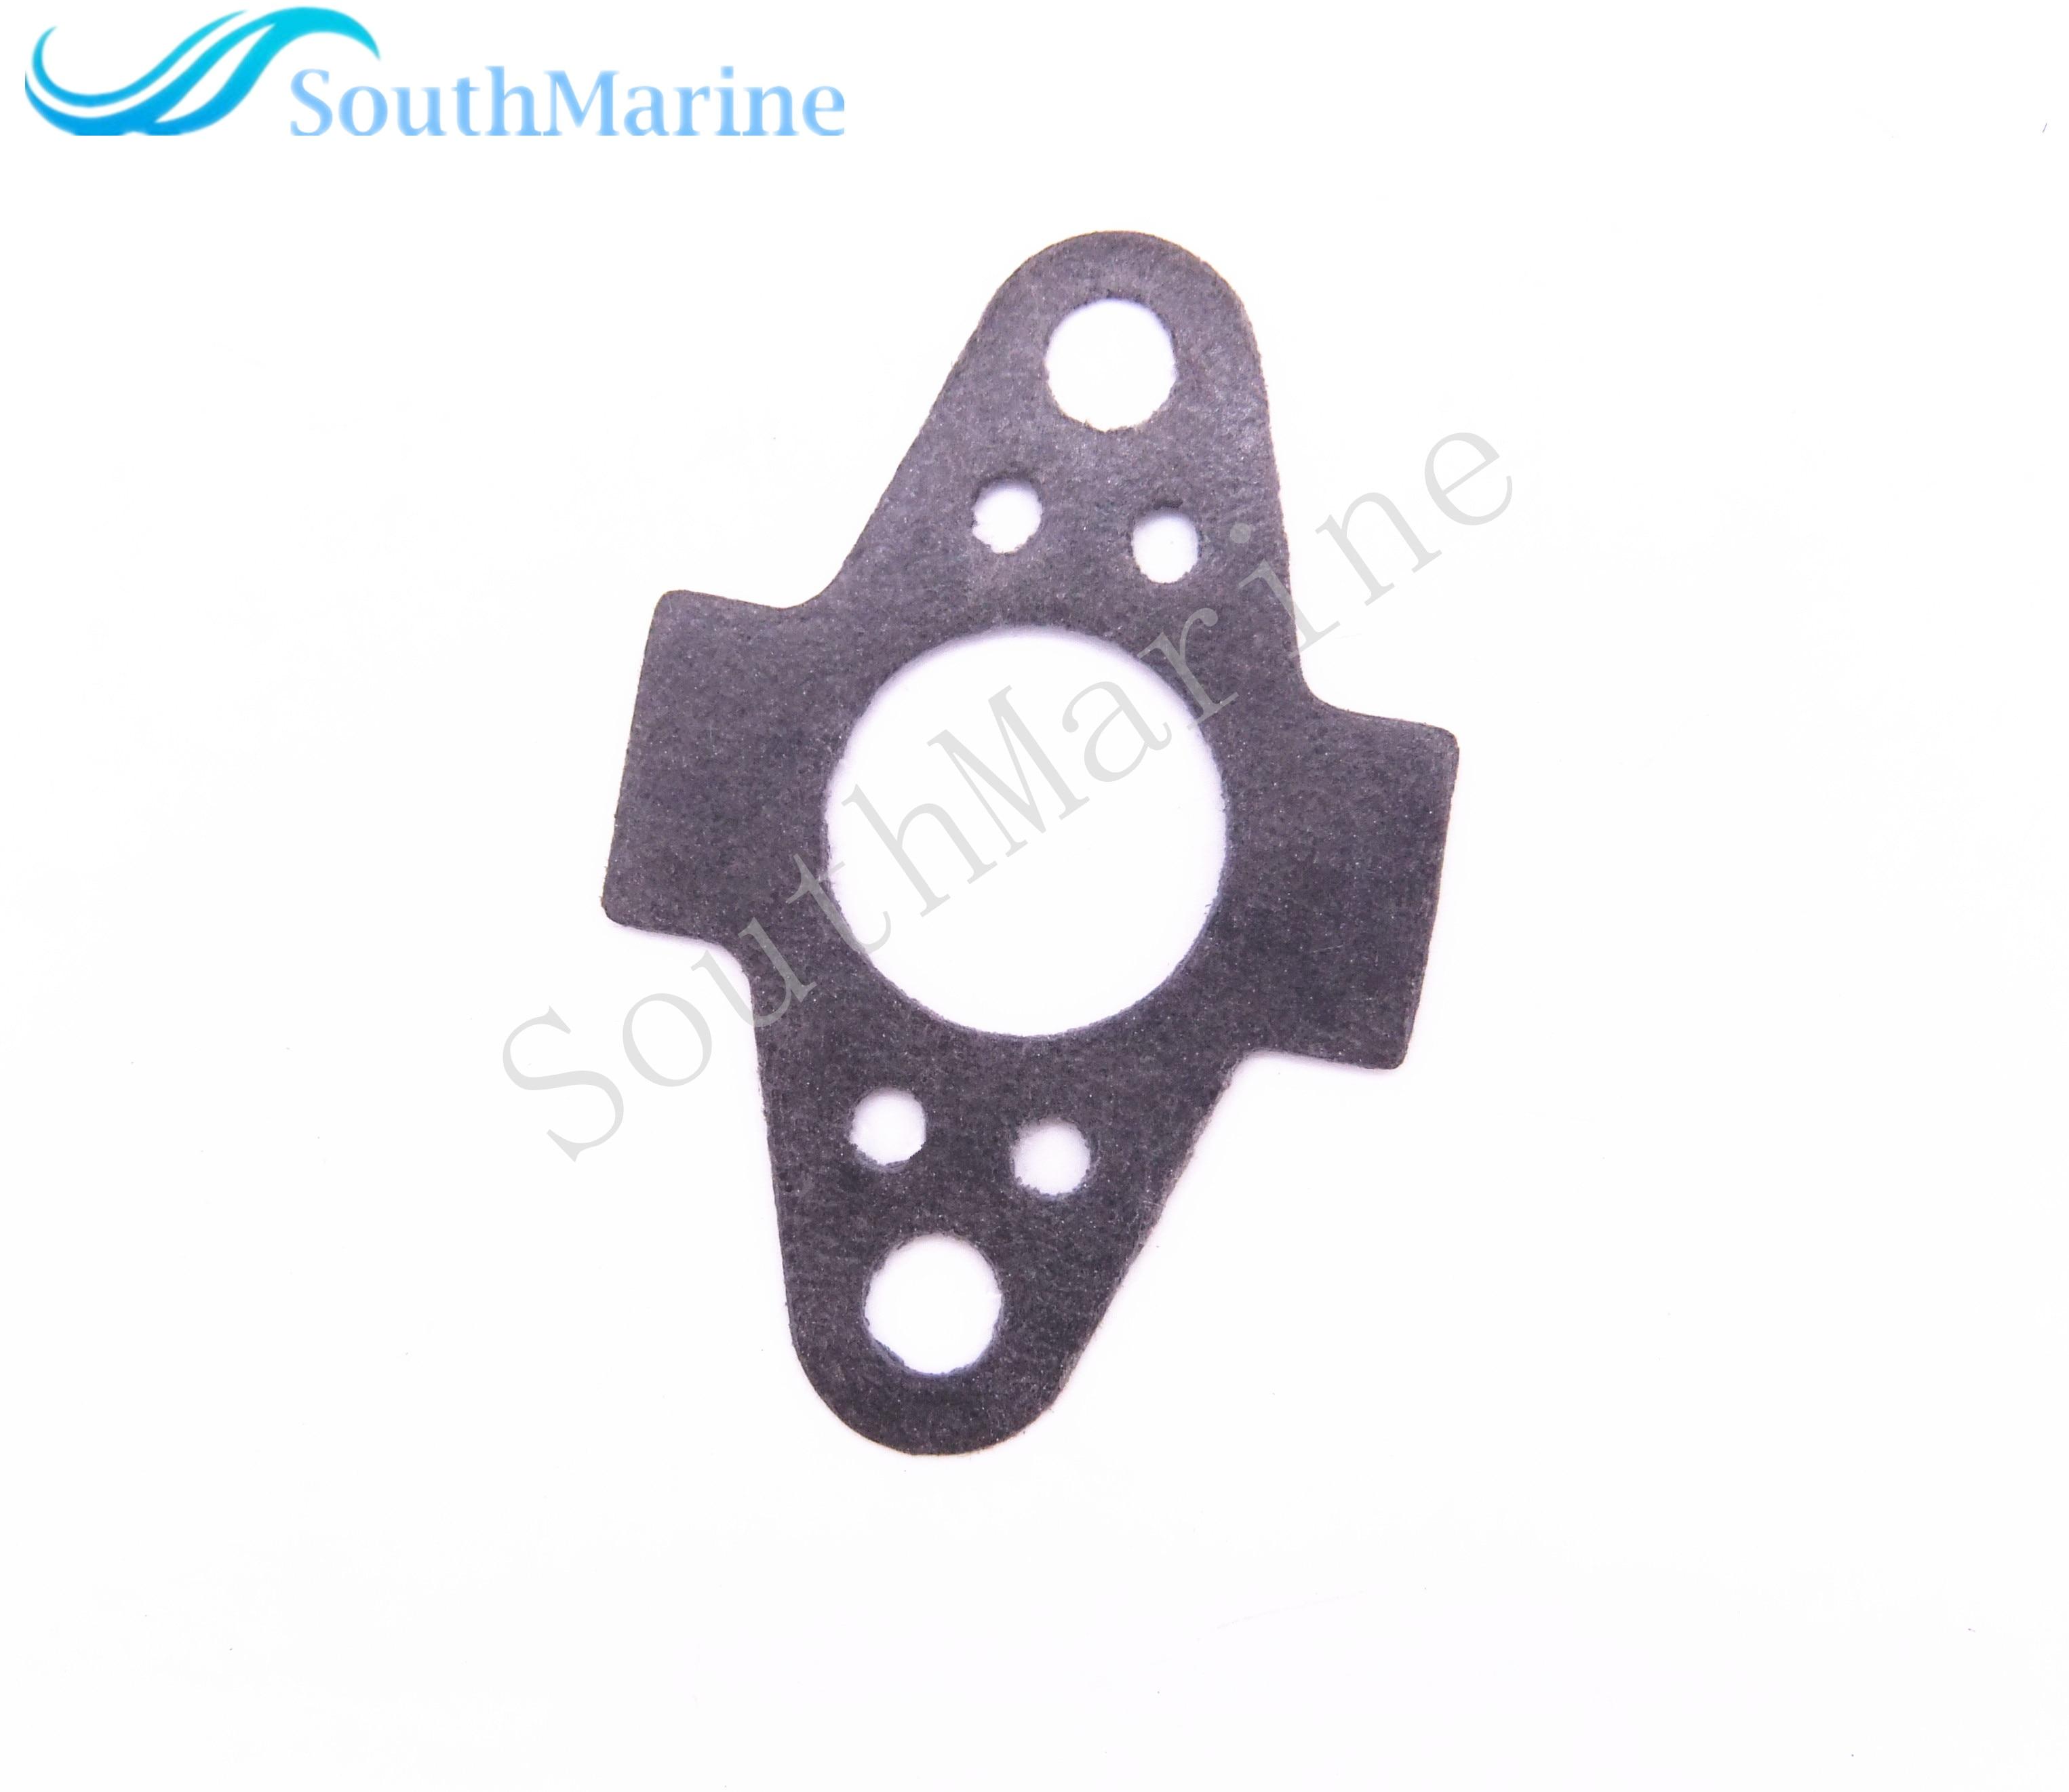 Outboard Engine F2.6-04000018 Carburetor Gasket for Parsun 4-Stroke F2.6 Boat Motor Free Shipping